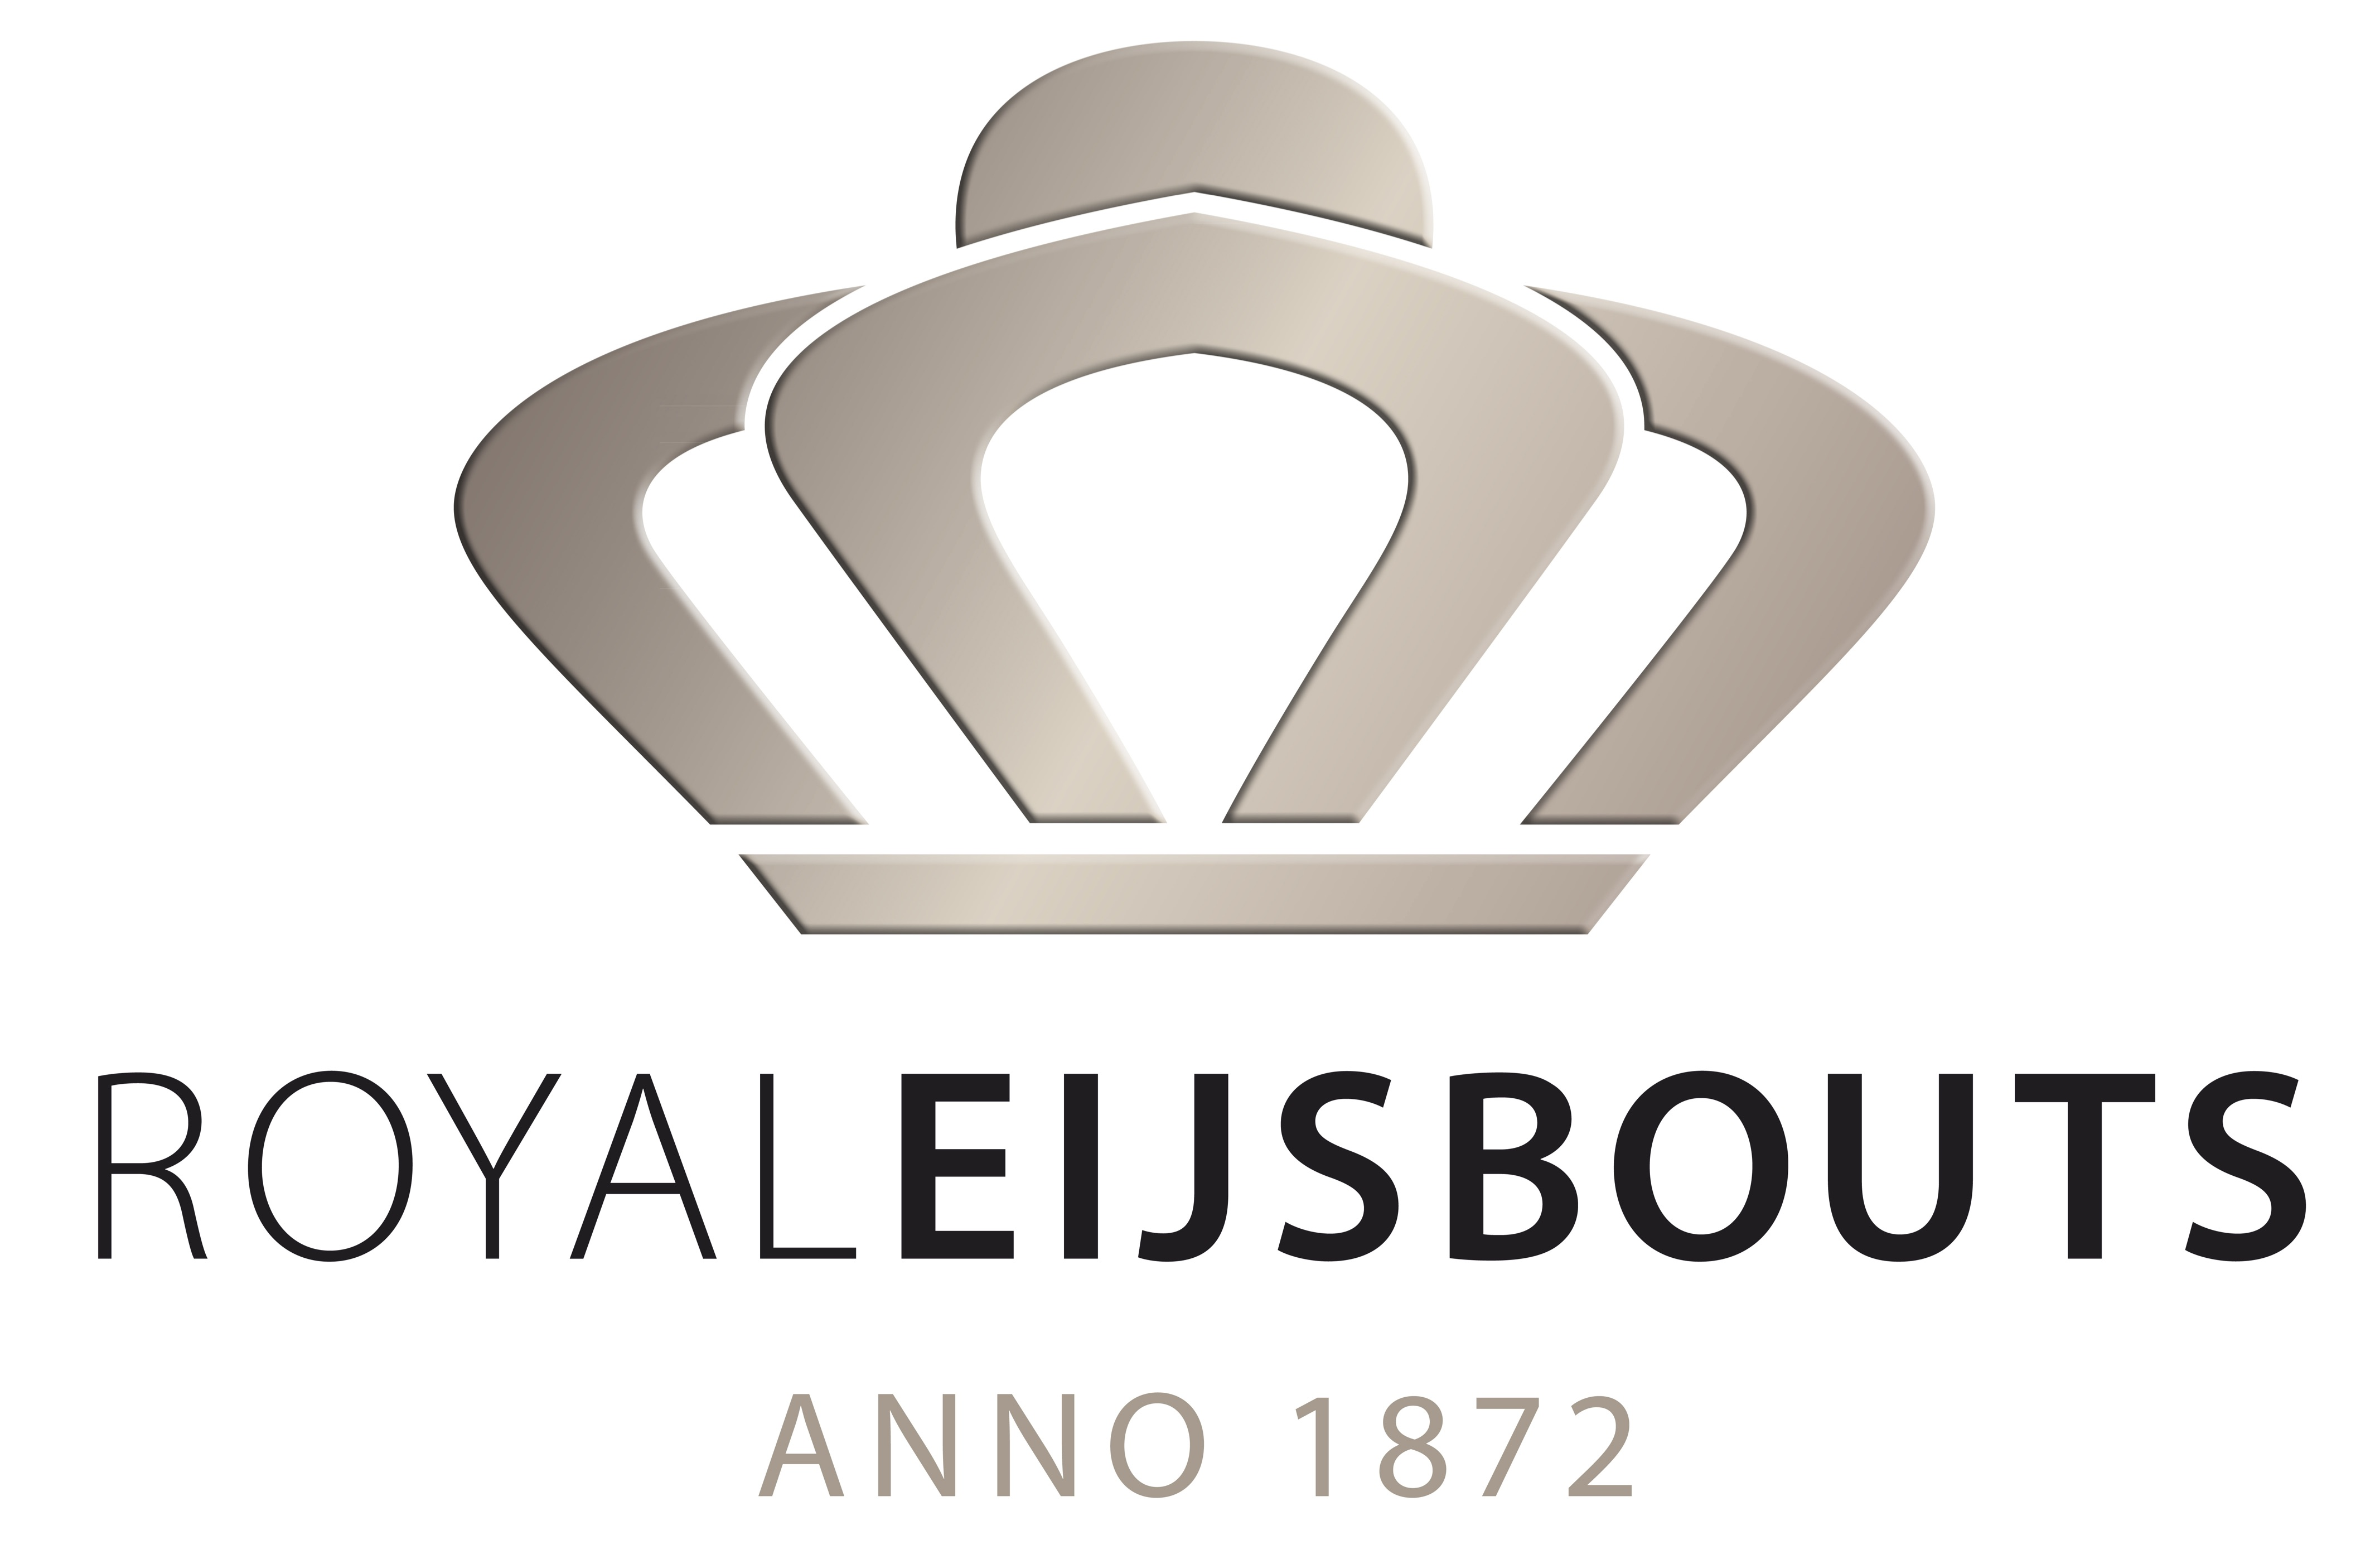 logo eijsbouts 3D 67x44cm